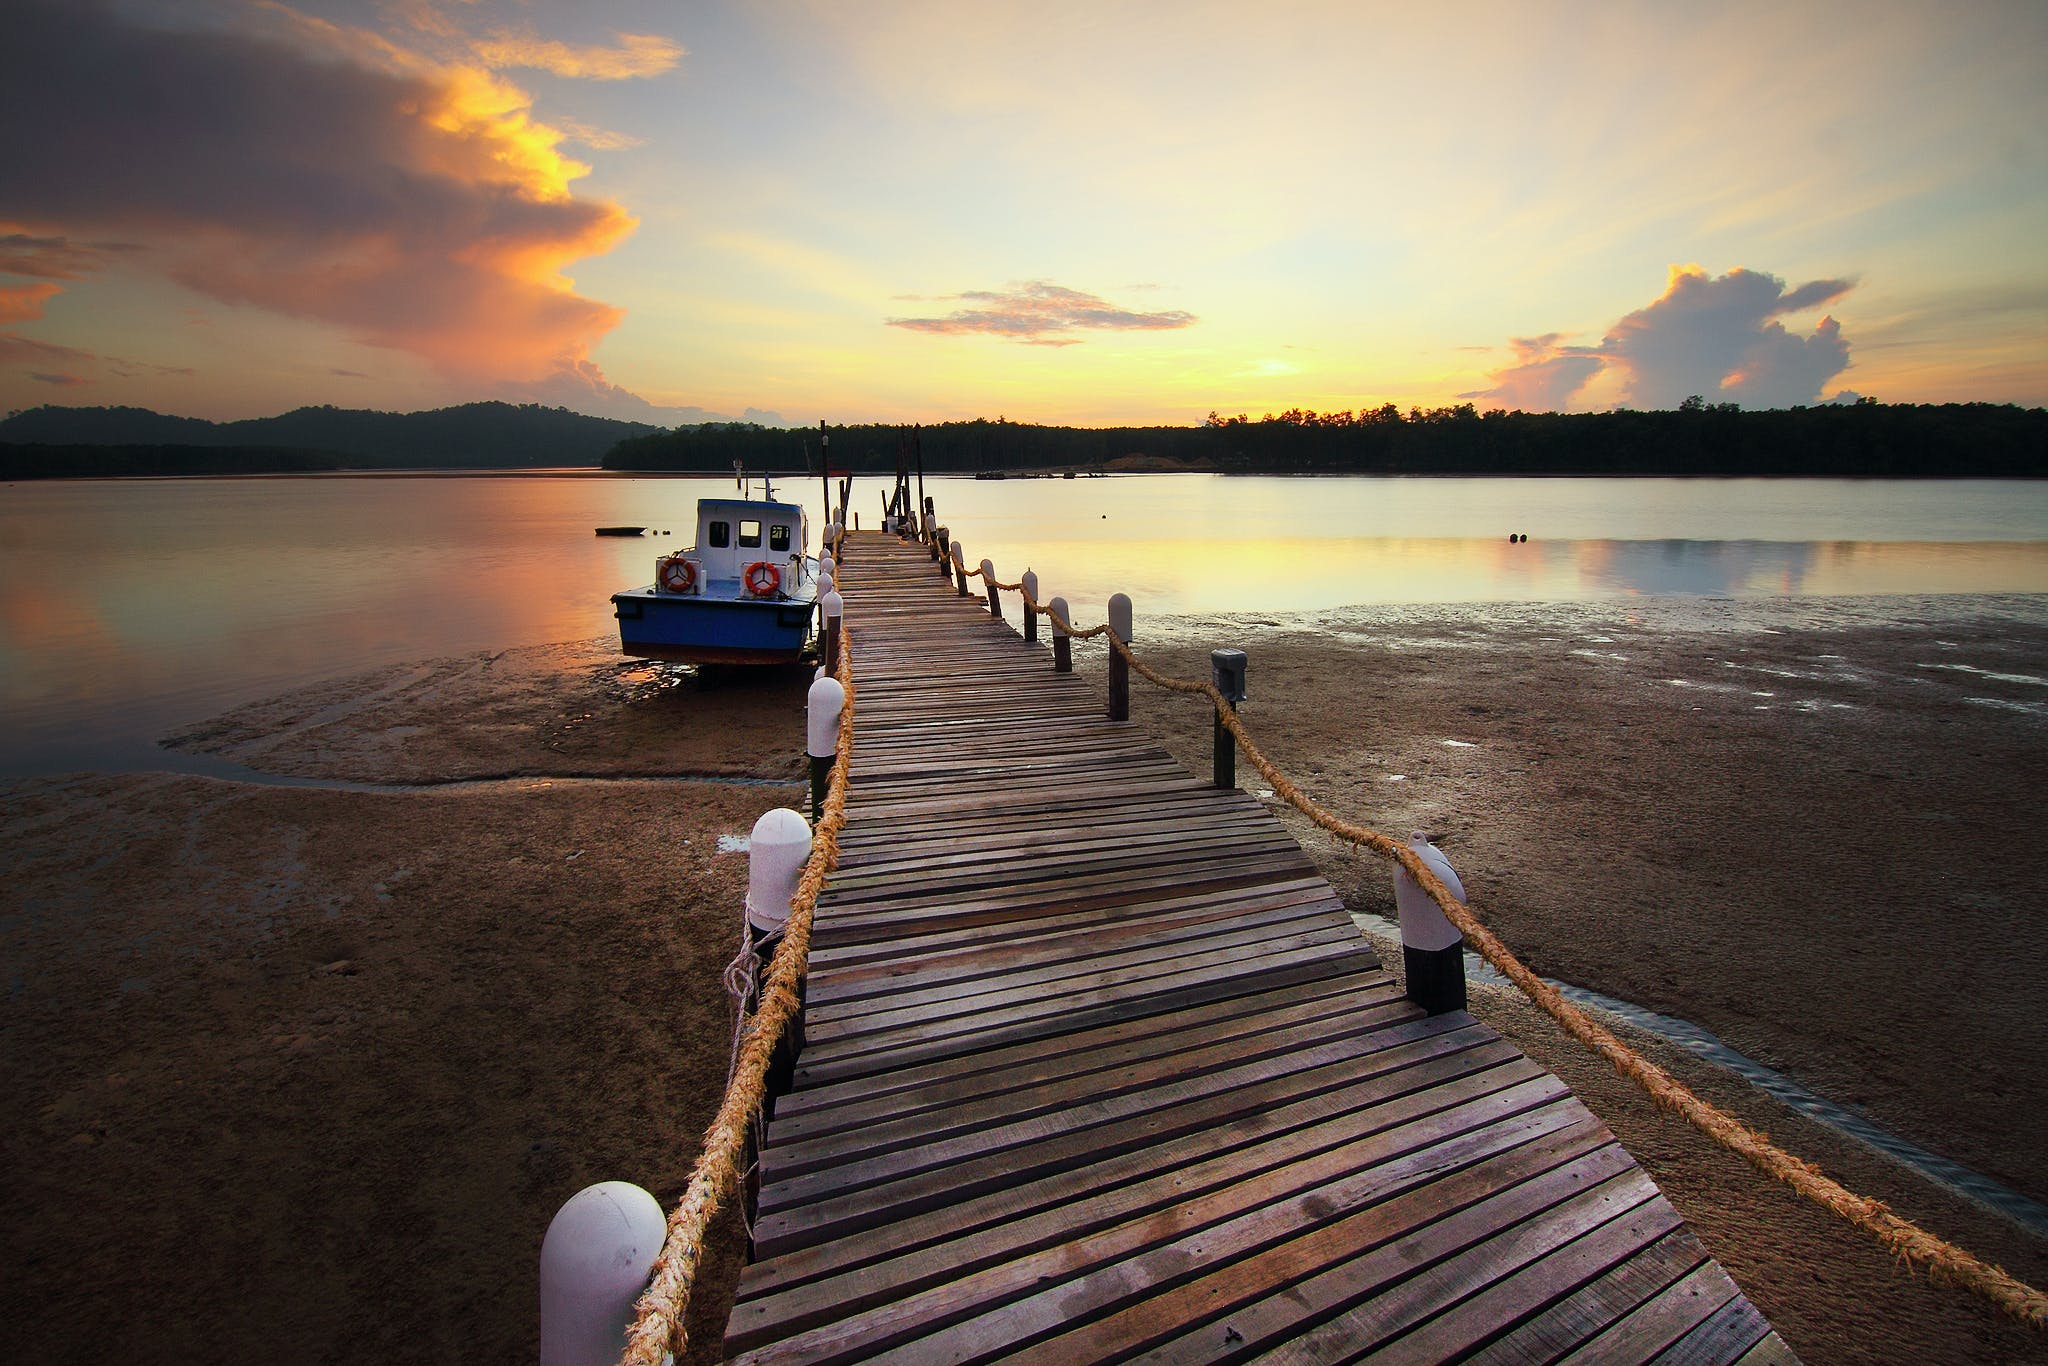 Fotos de stock gratuitas de agua, amanecer, arboles, barca